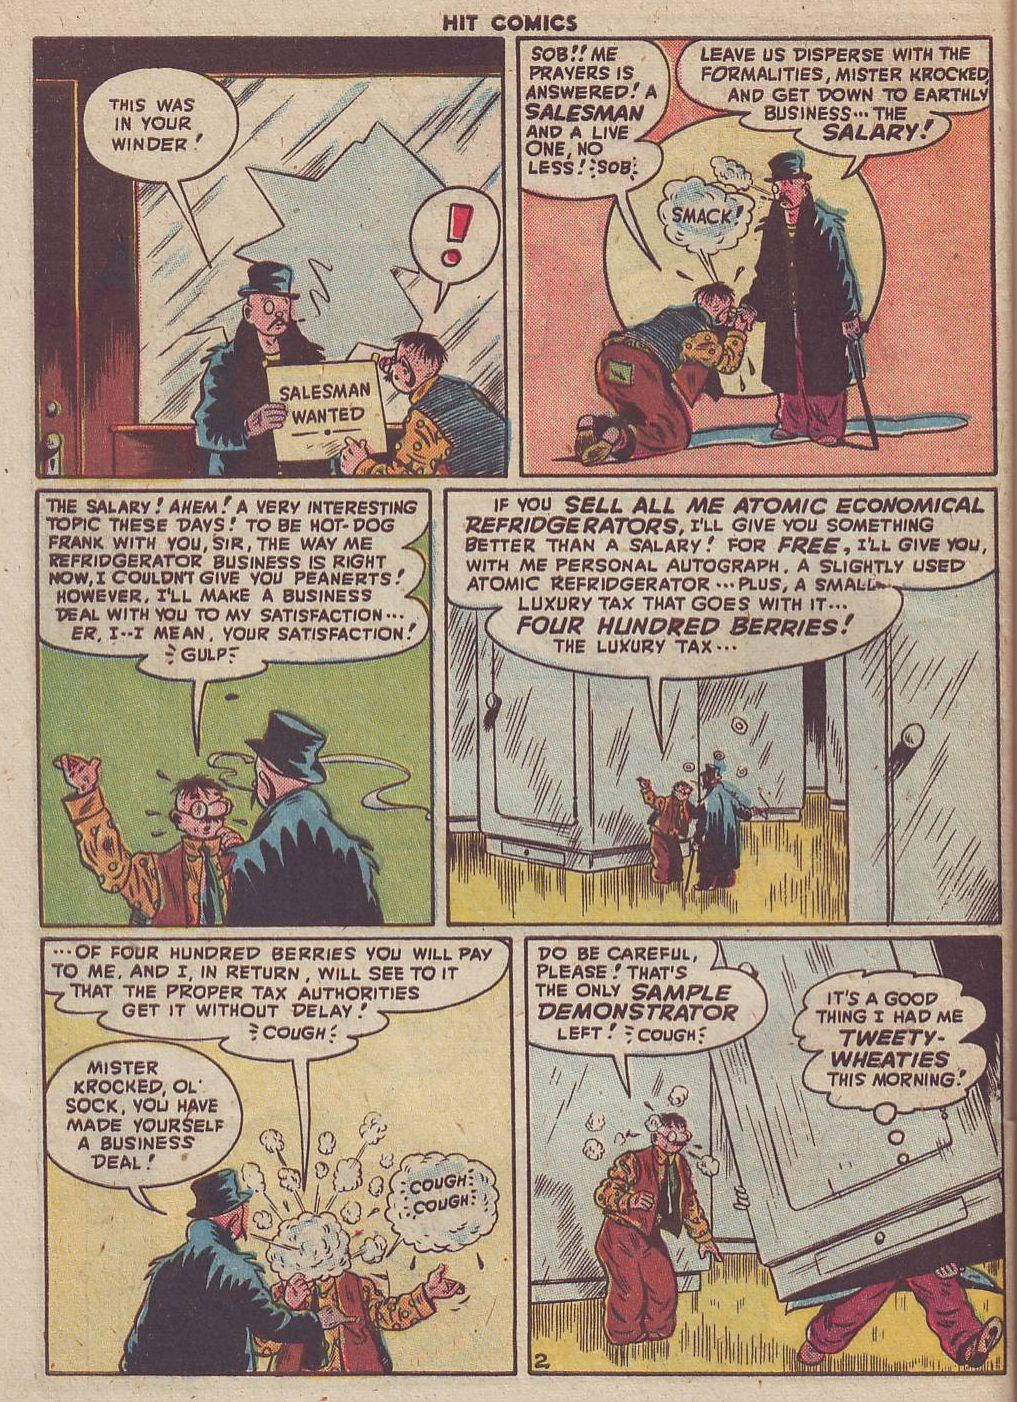 Read online Hit Comics comic -  Issue #51 - 40